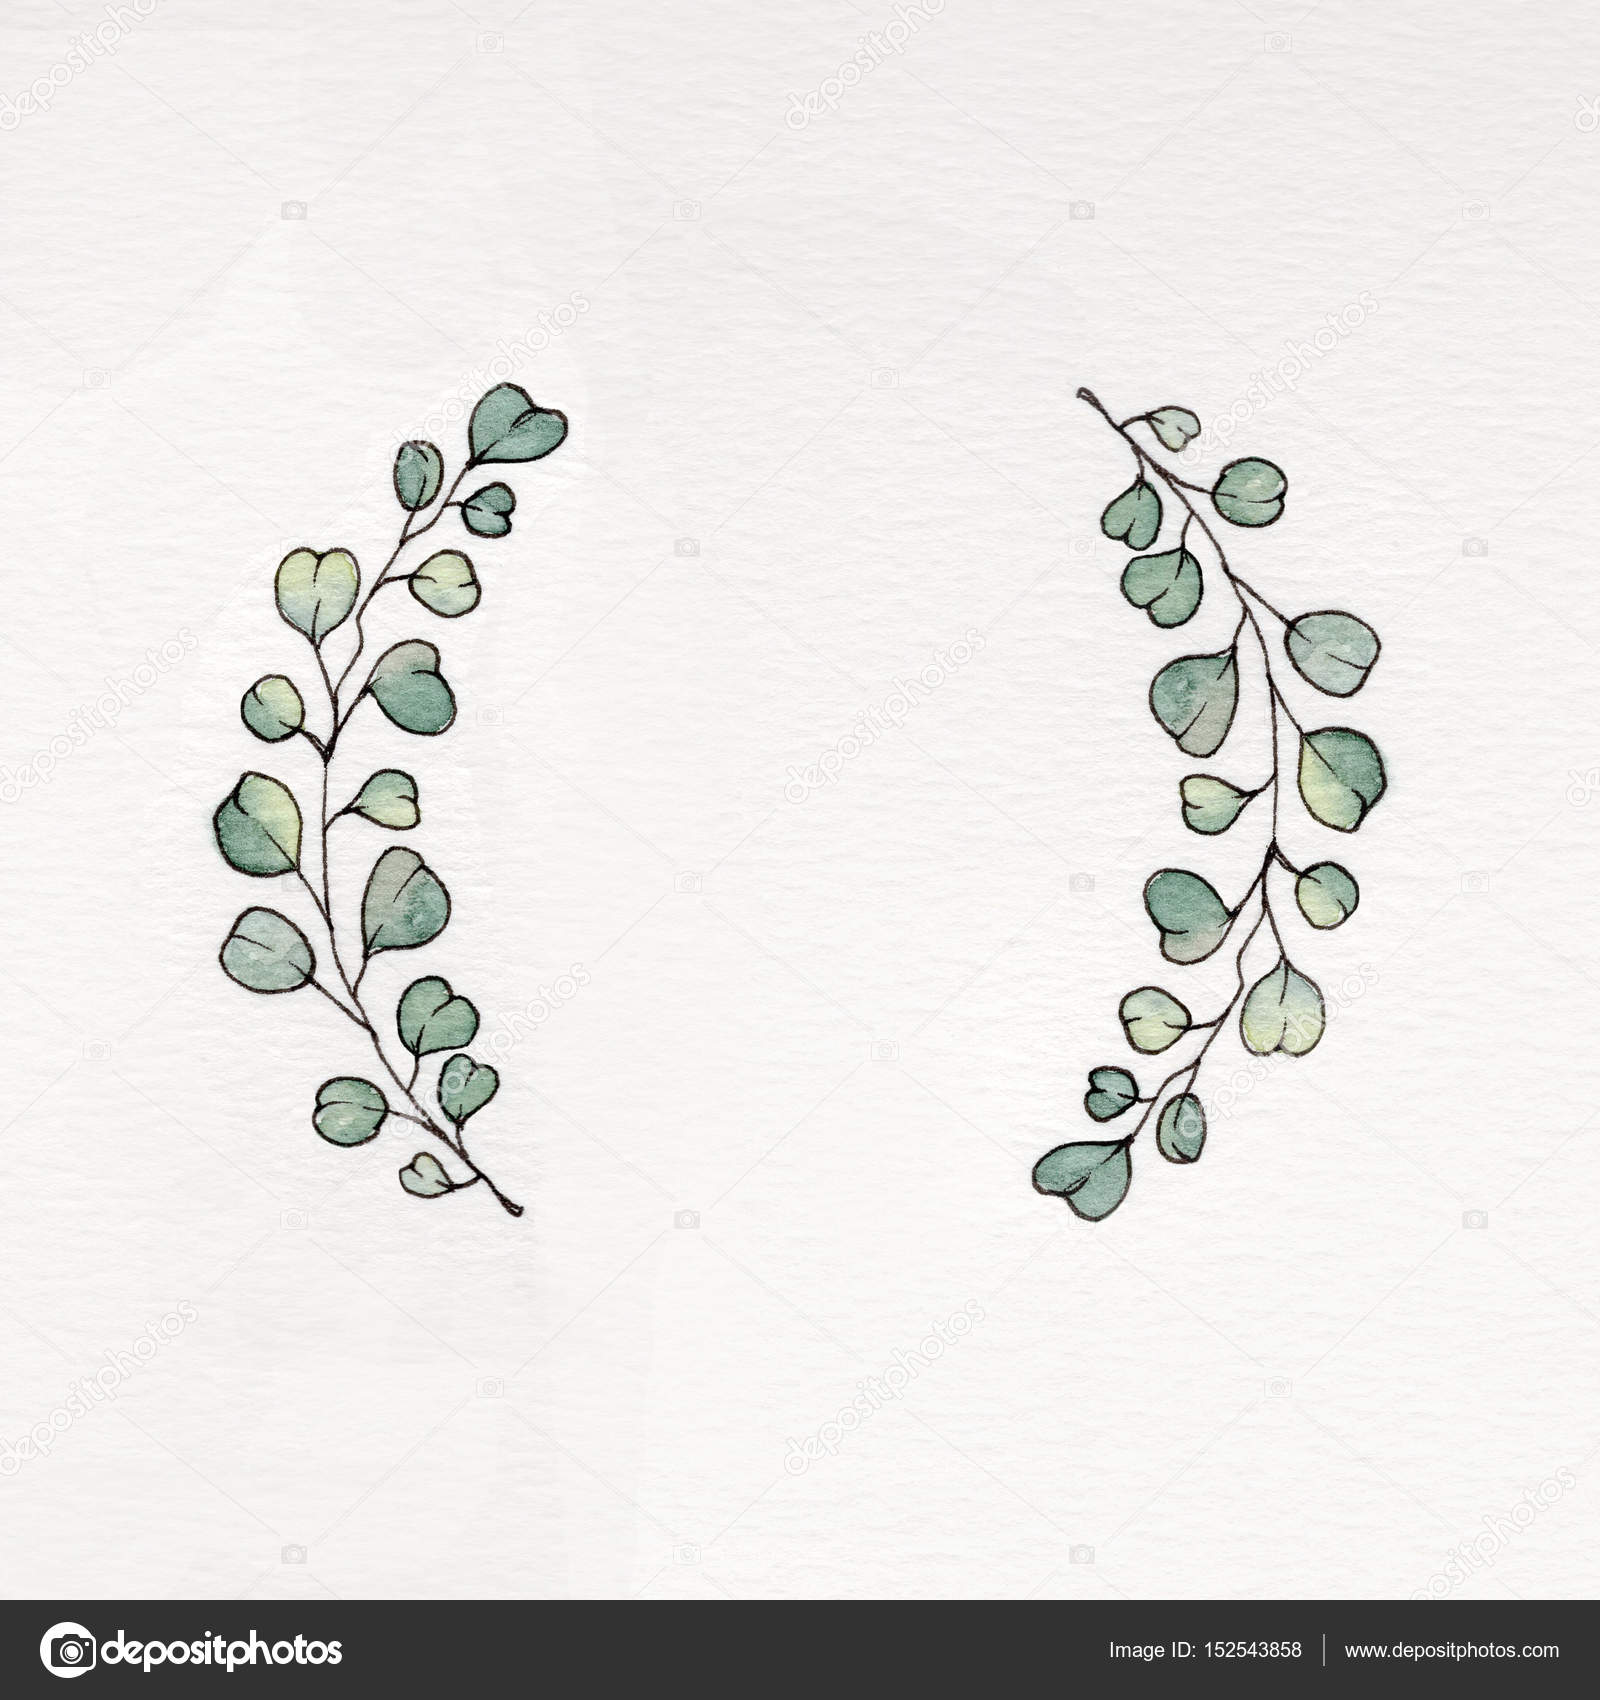 Acuarela guirnalda con hojas de eucalipto — Fotos de Stock ...